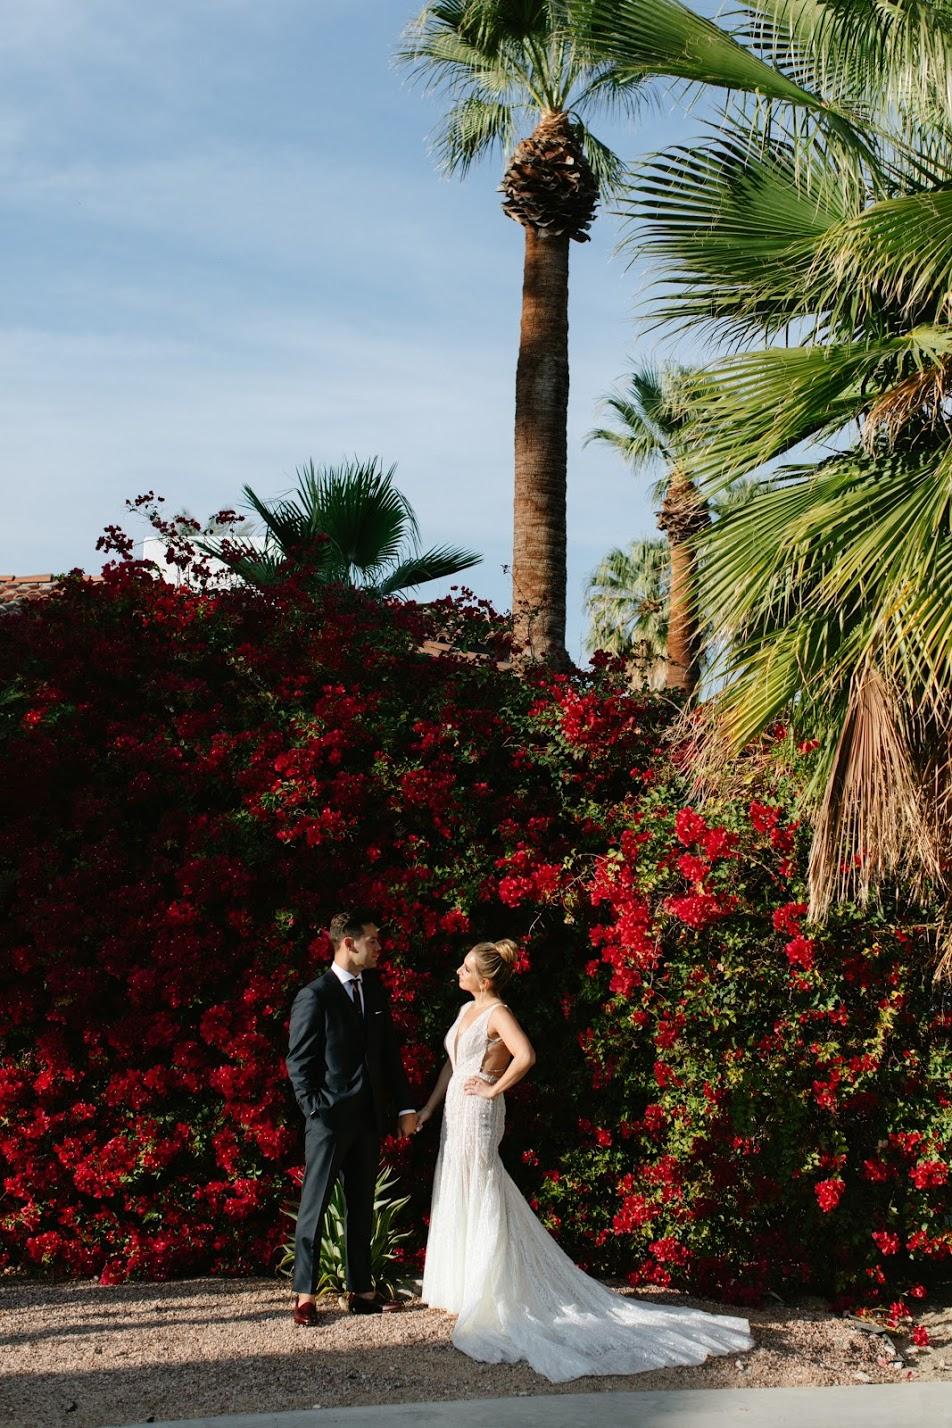 Dara_&_Garrett_Colony_Palms_Hotel_Wedding_Photos-198.jpg